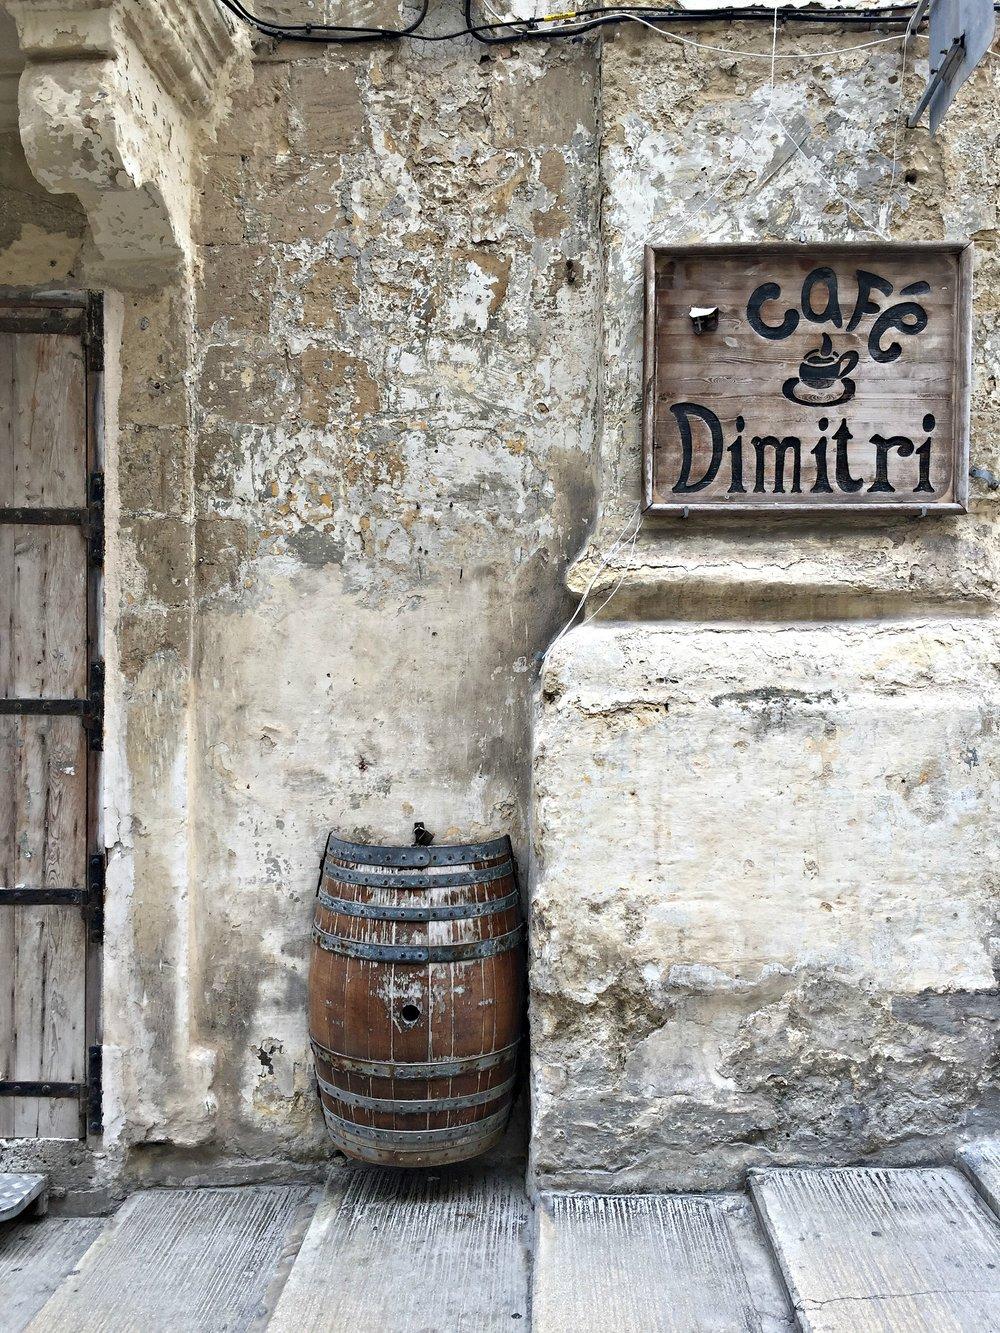 Malta Valletta Cafe Dimitri